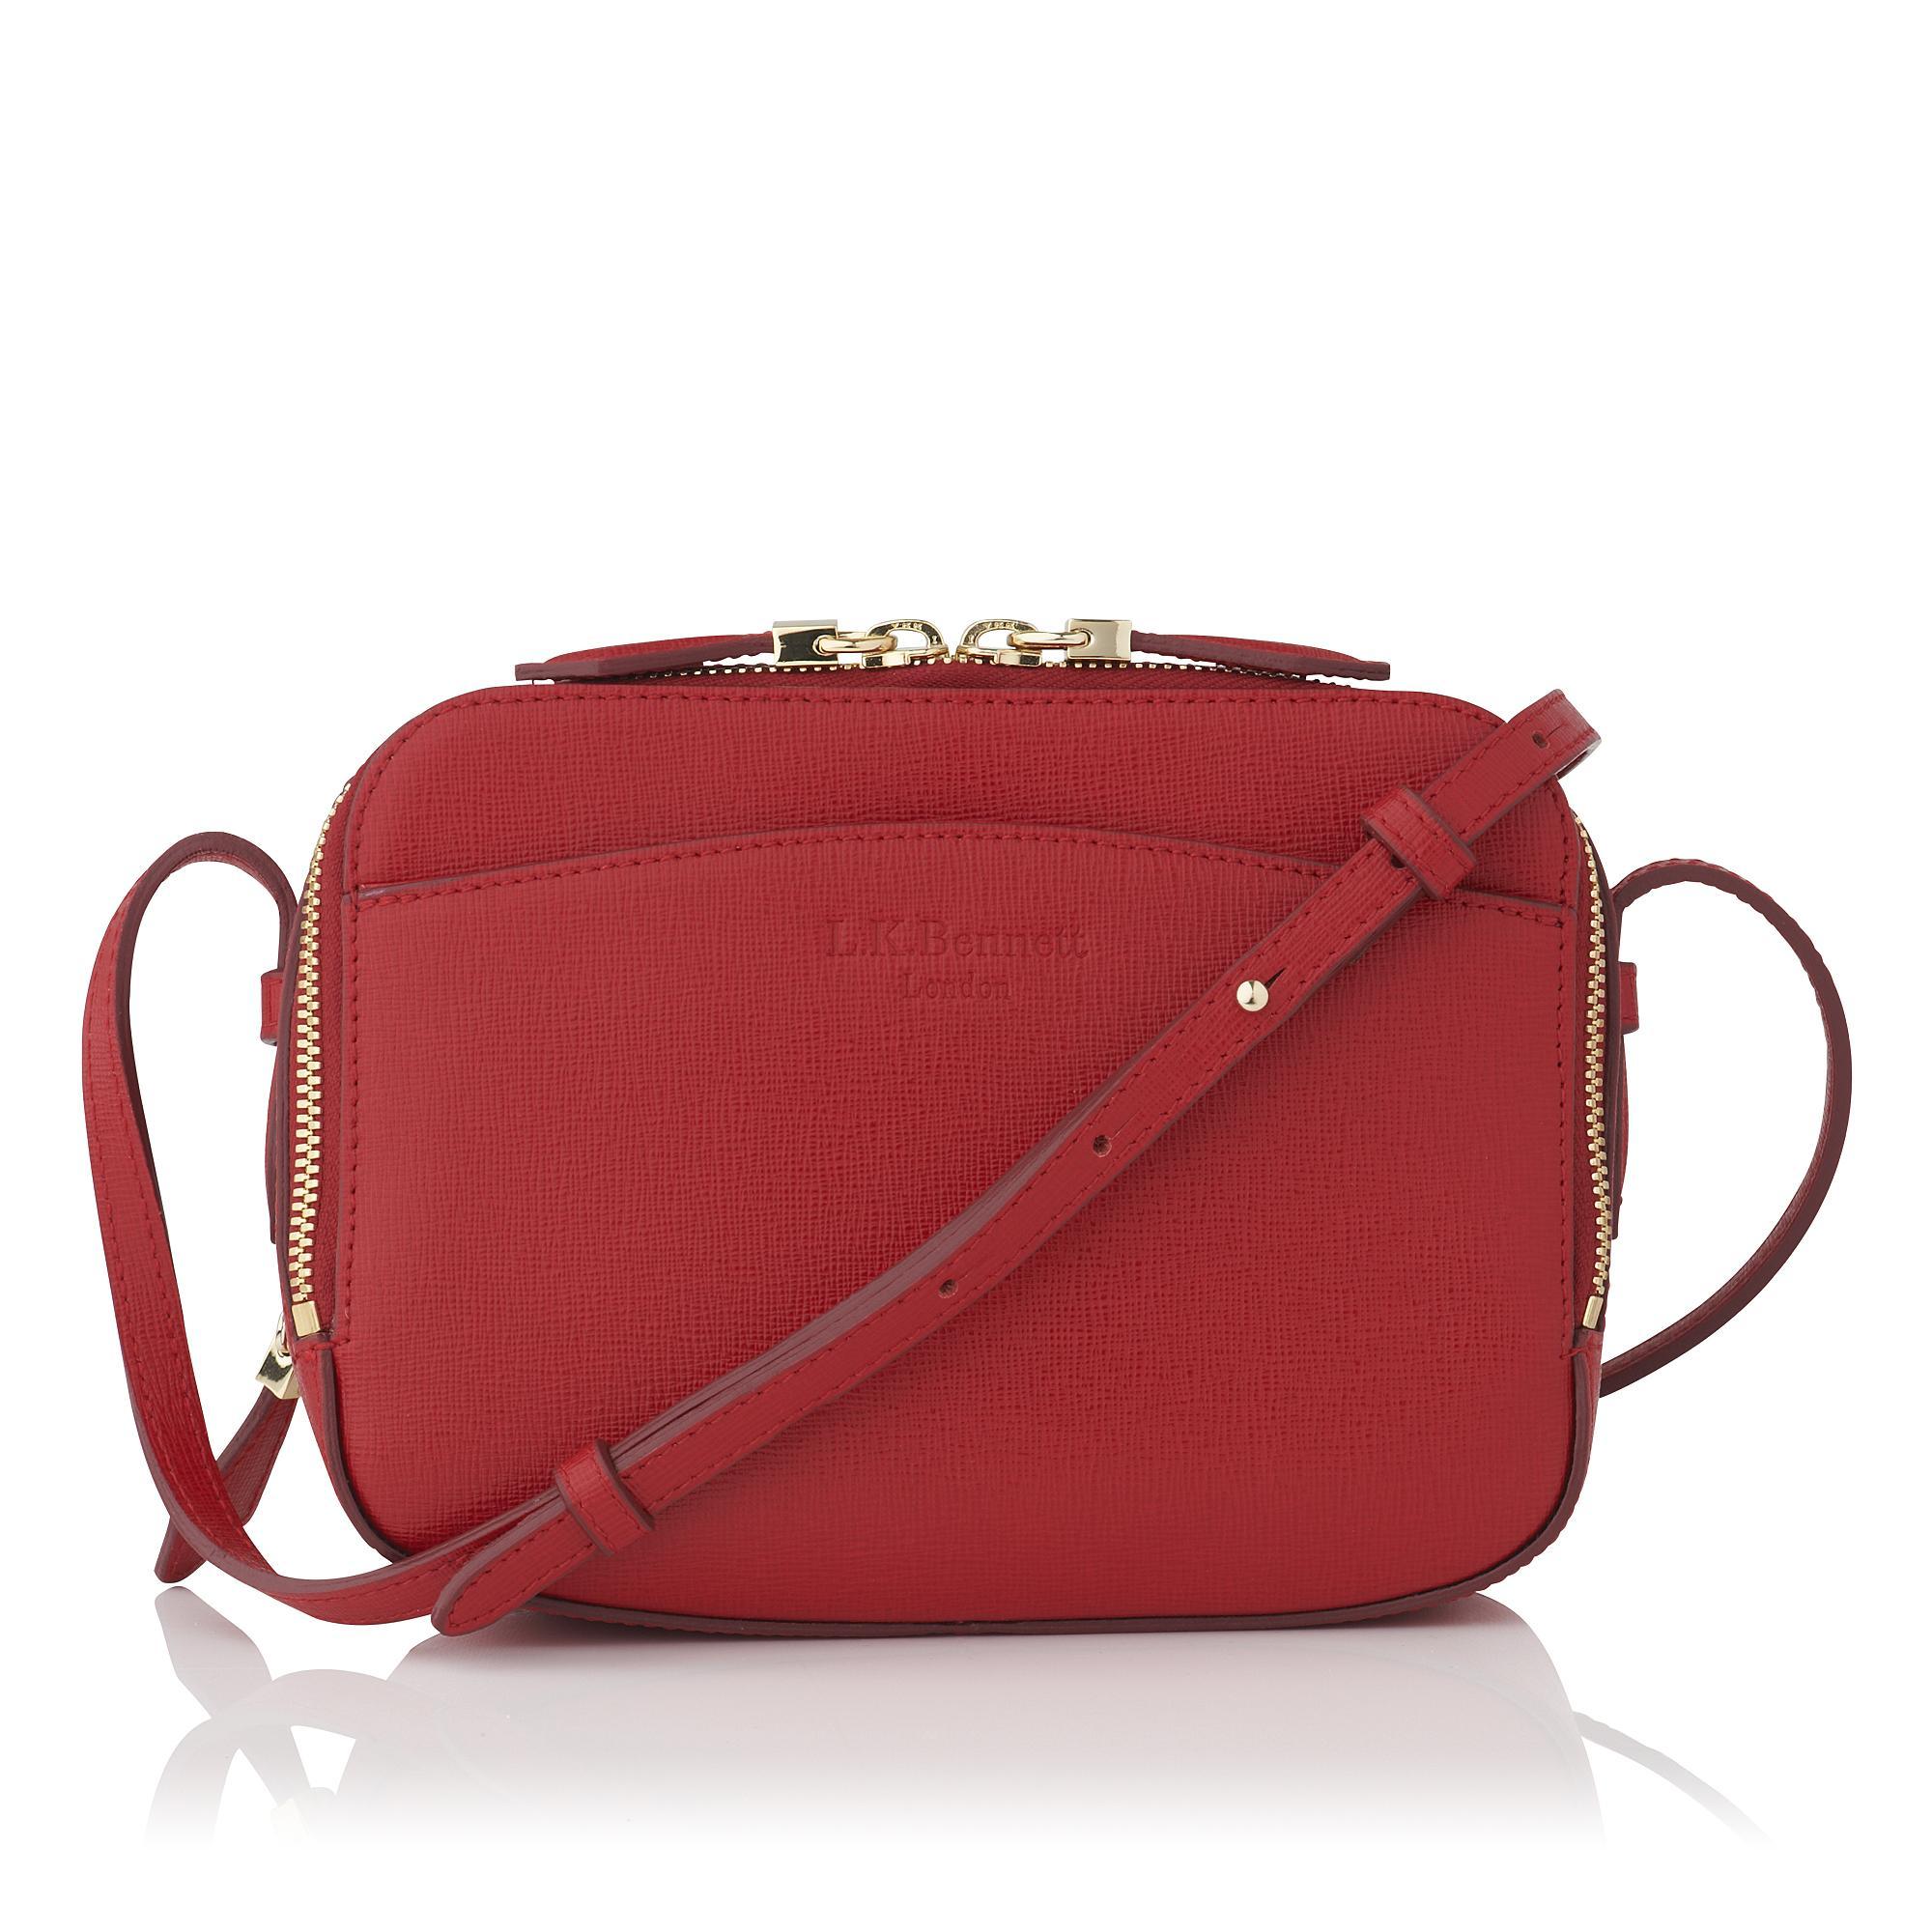 098b5f90dbc1 Mariel Red Saffiano Leather Shoulder Bag | Shoulder Bags | Handbags |  Collections | L.K.Bennett, London